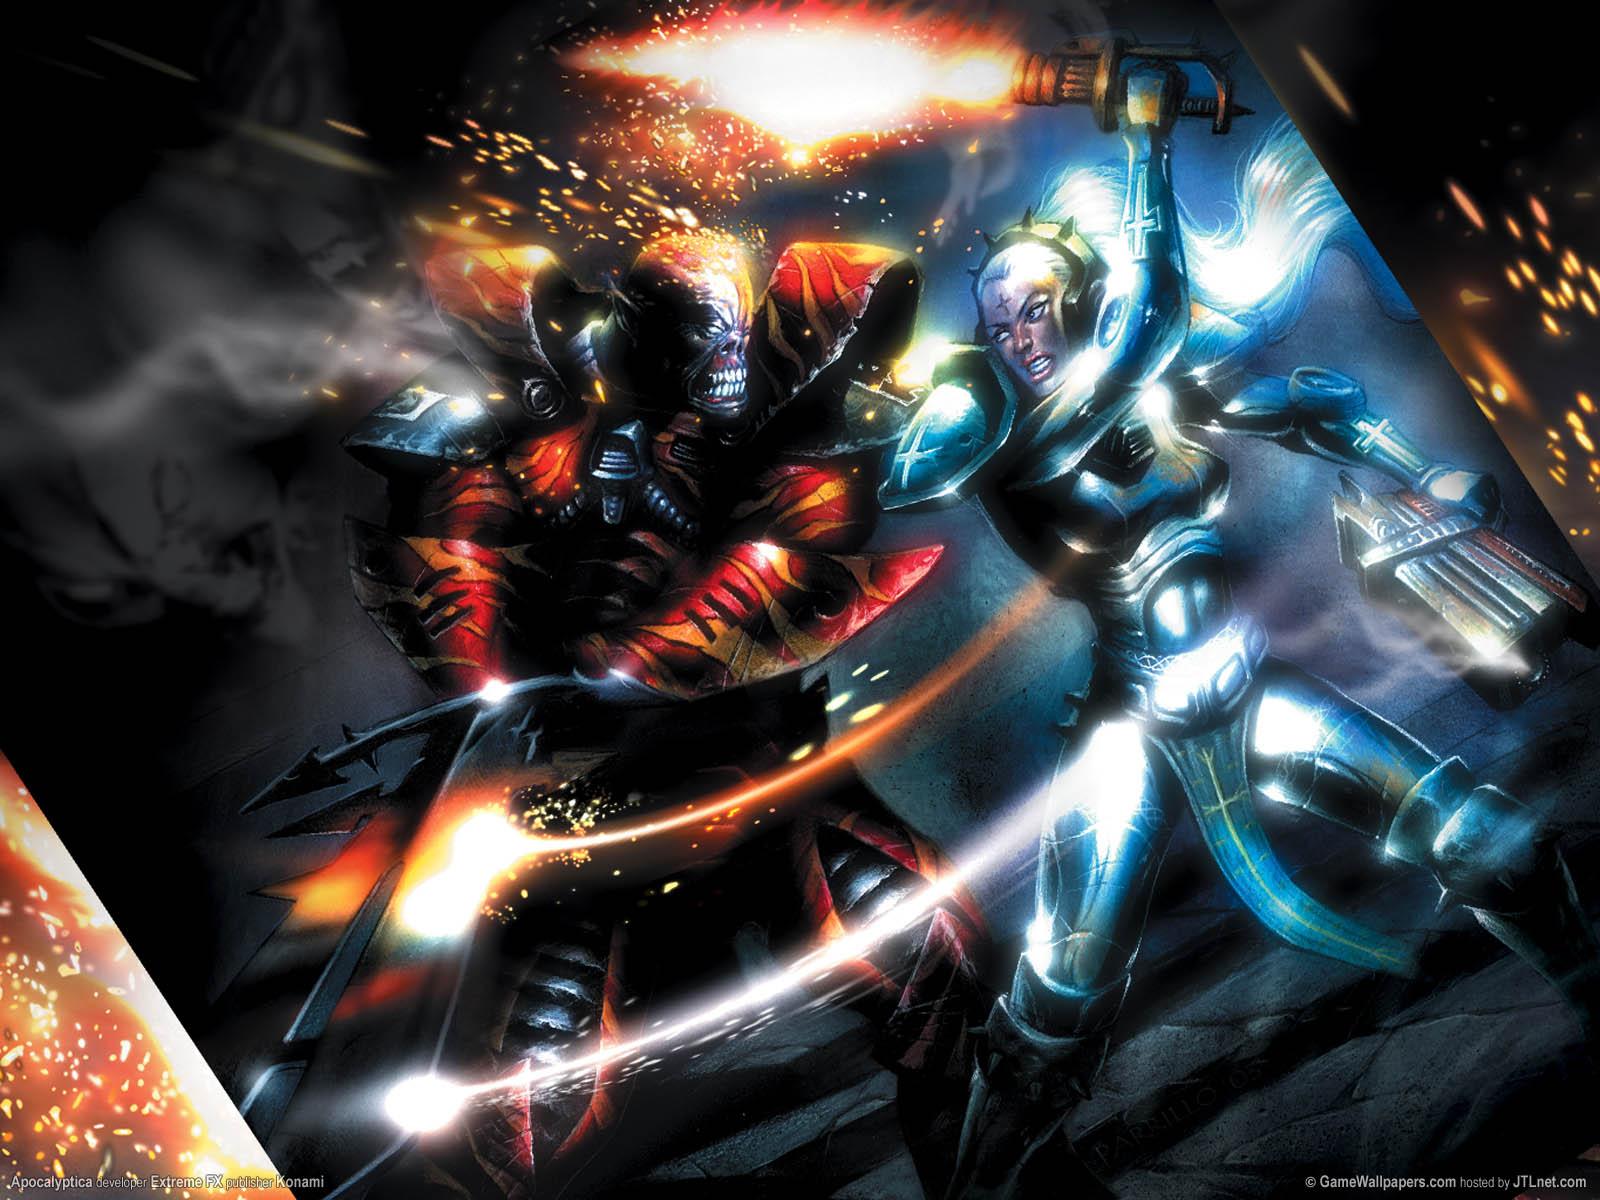 http://4.bp.blogspot.com/-qfh-ejm_VFs/TzLgmlbhk9I/AAAAAAAAHH0/MTx-5_7cwz0/s1600/Apocalyptica_(PC_Game).jpg